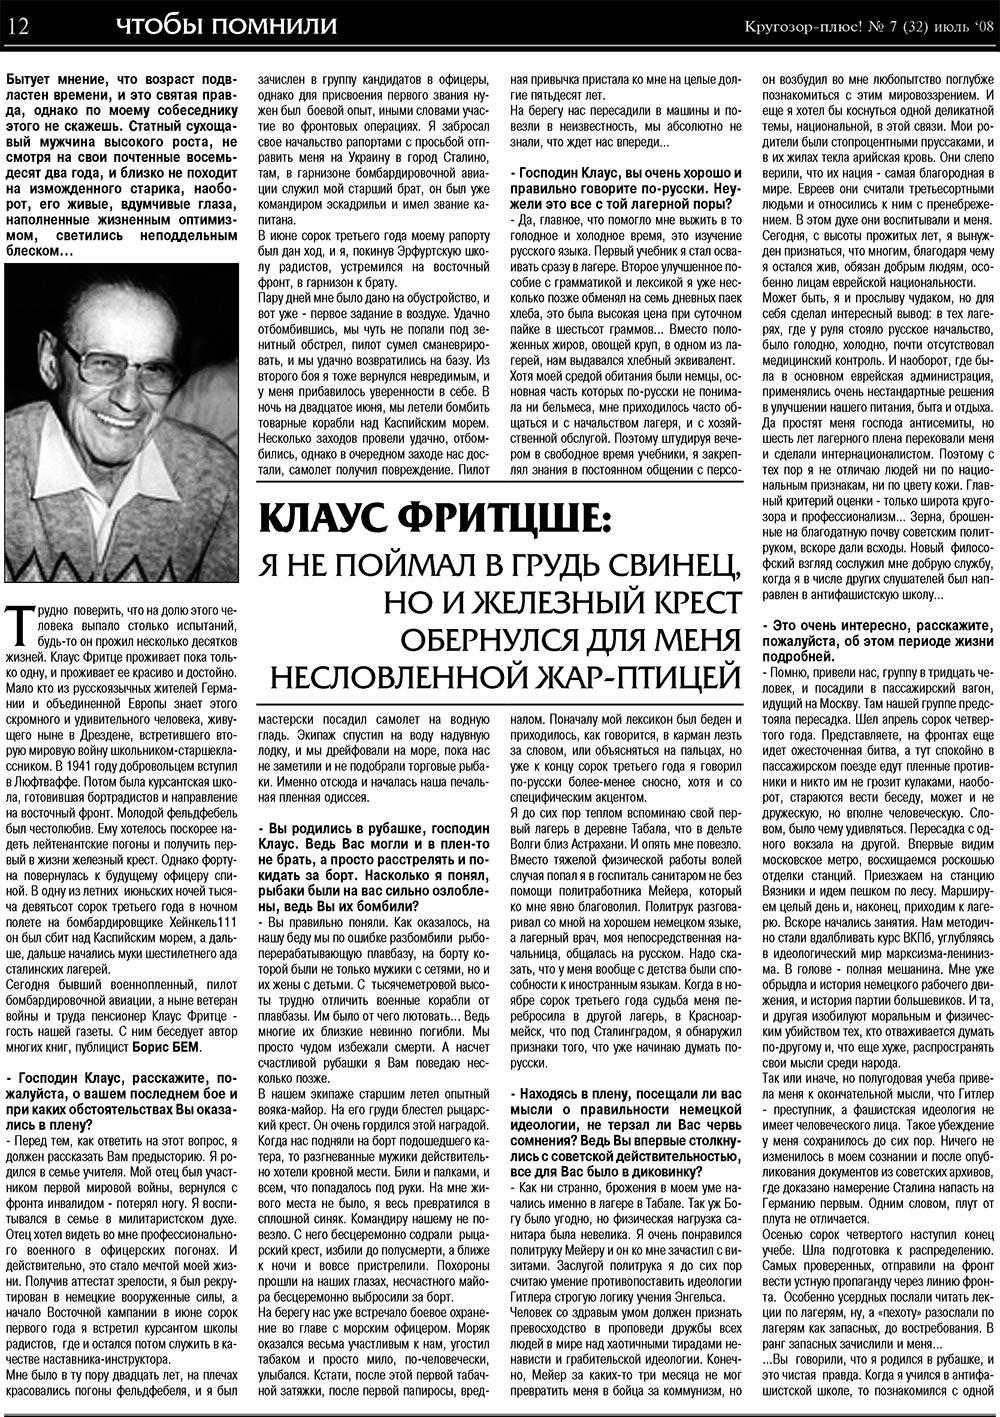 Кругозор плюс! (газета). 2008 год, номер 7, стр. 12